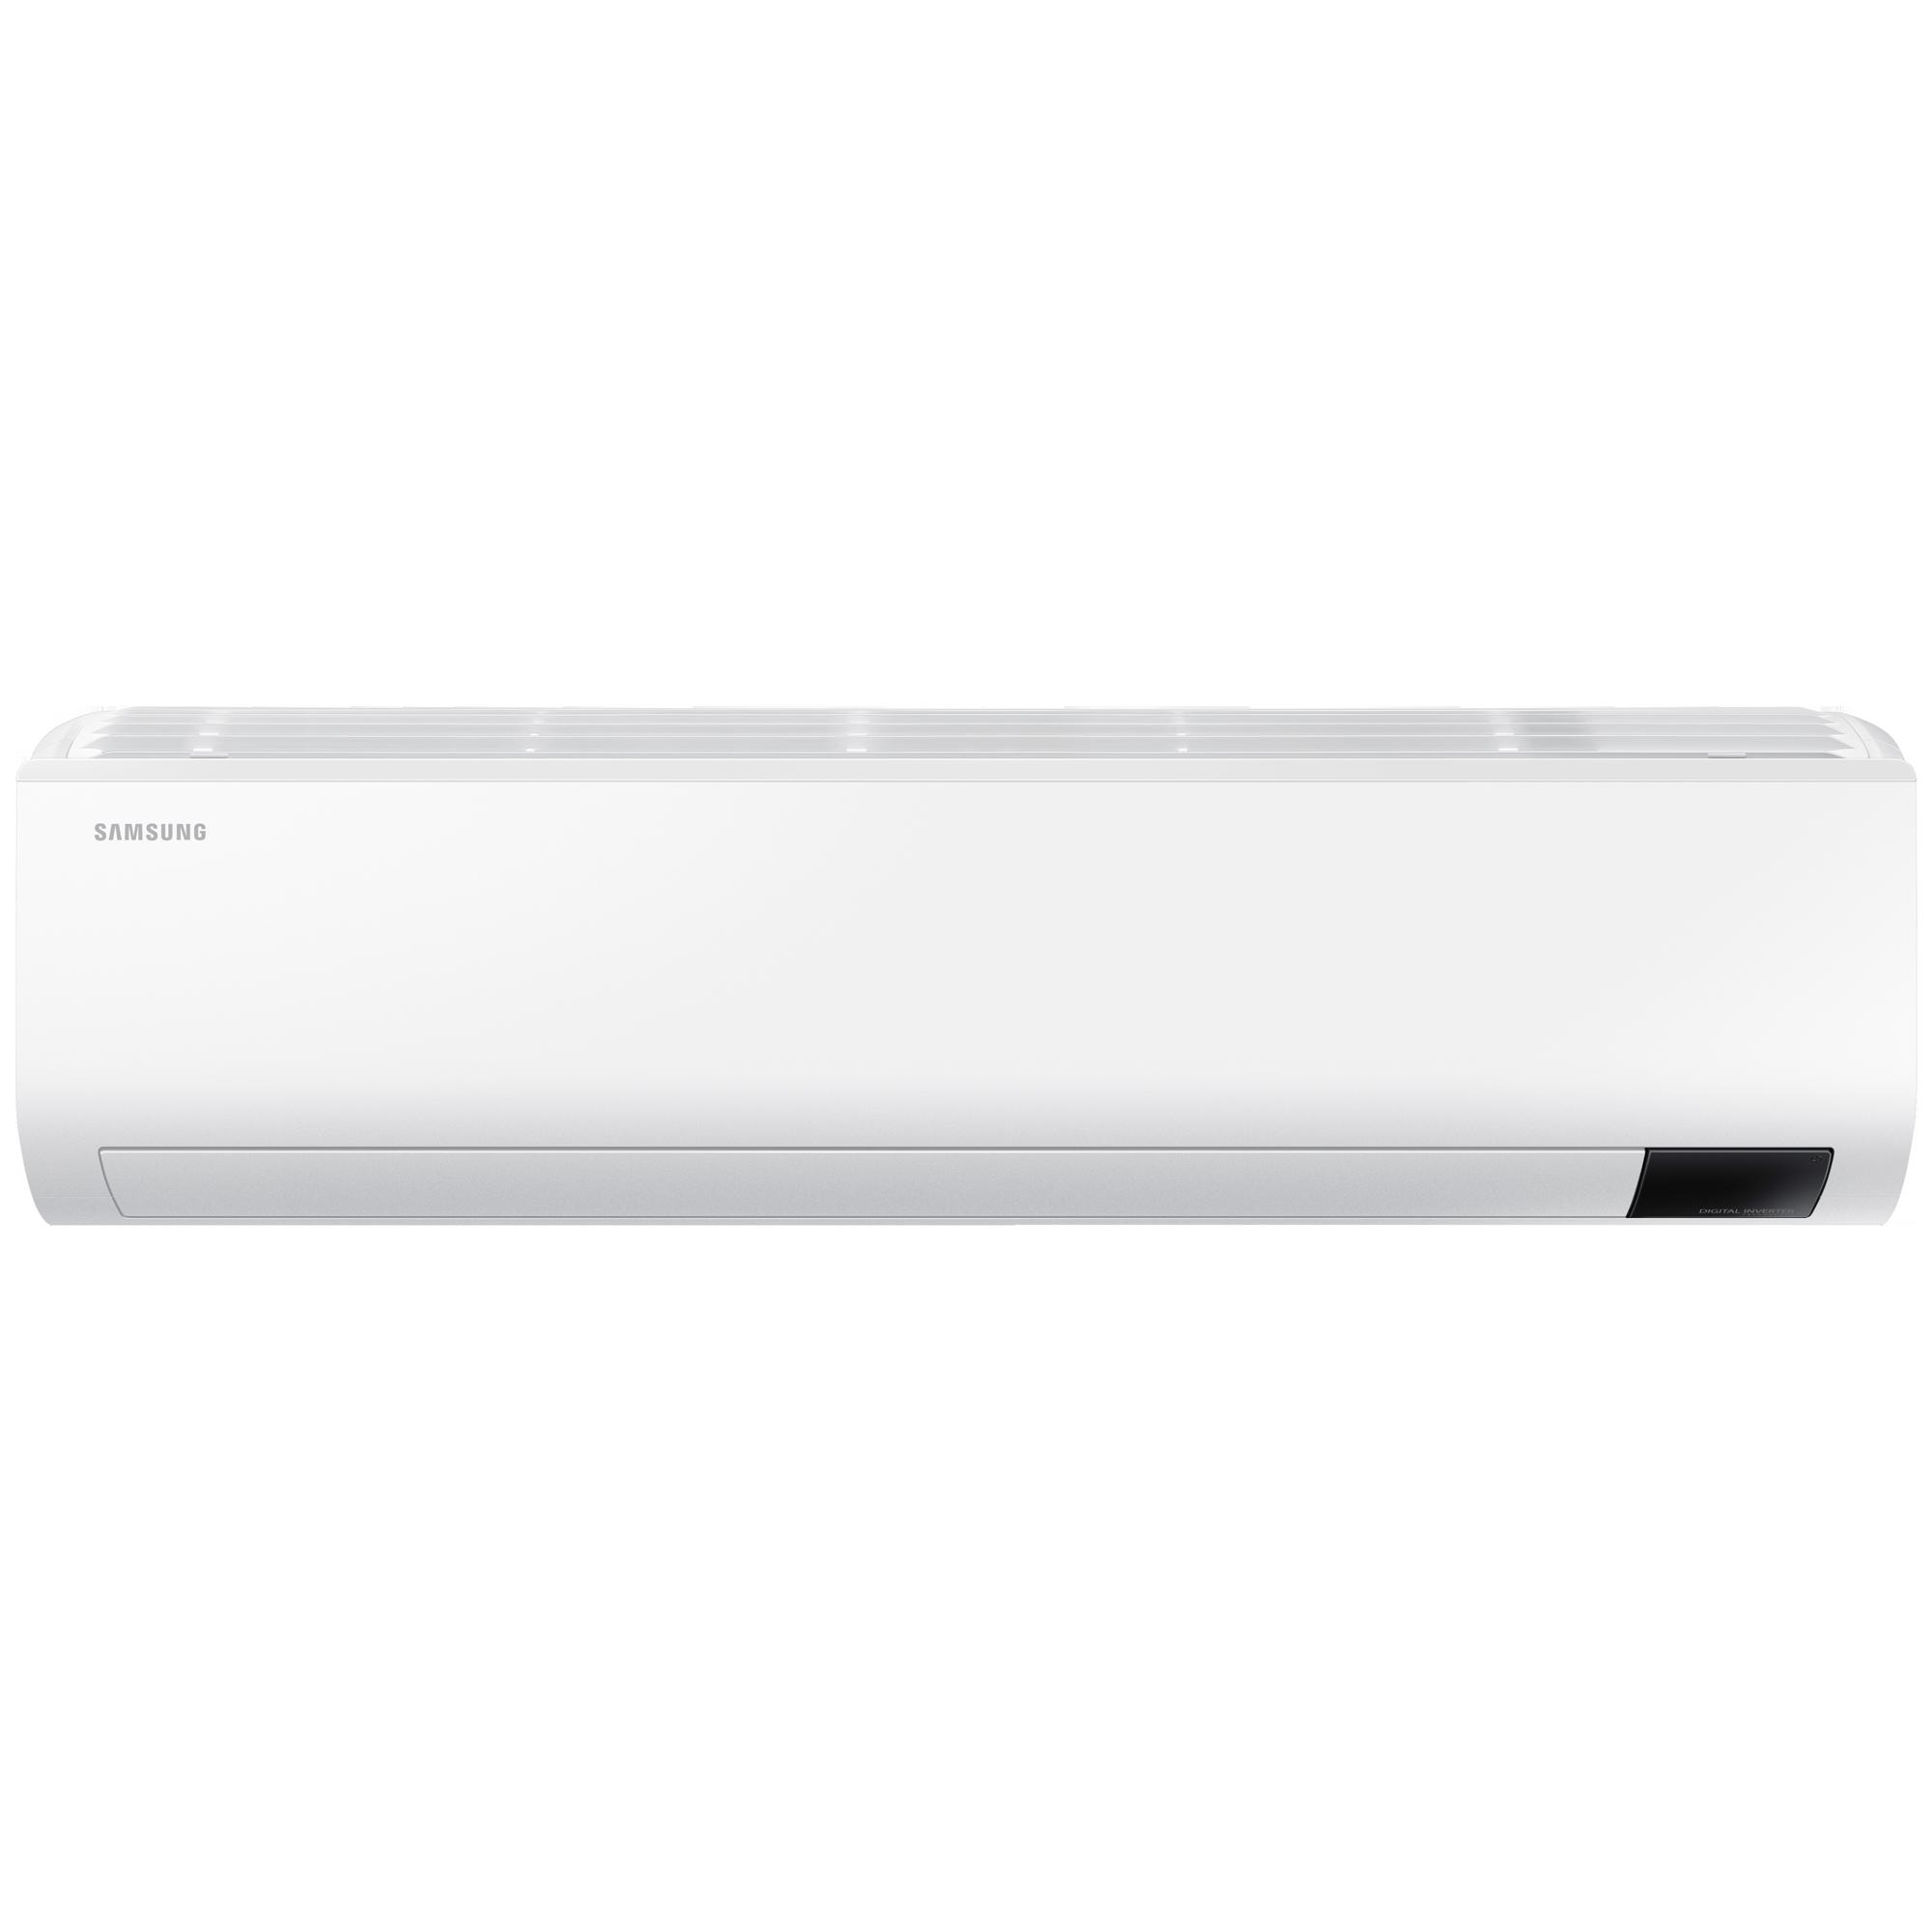 Samsung Airise 1.5 Ton 5 Star Inverter Split AC (Copper Condenser, AR18AY5ZAWK, Deco Wk (DA White))_1